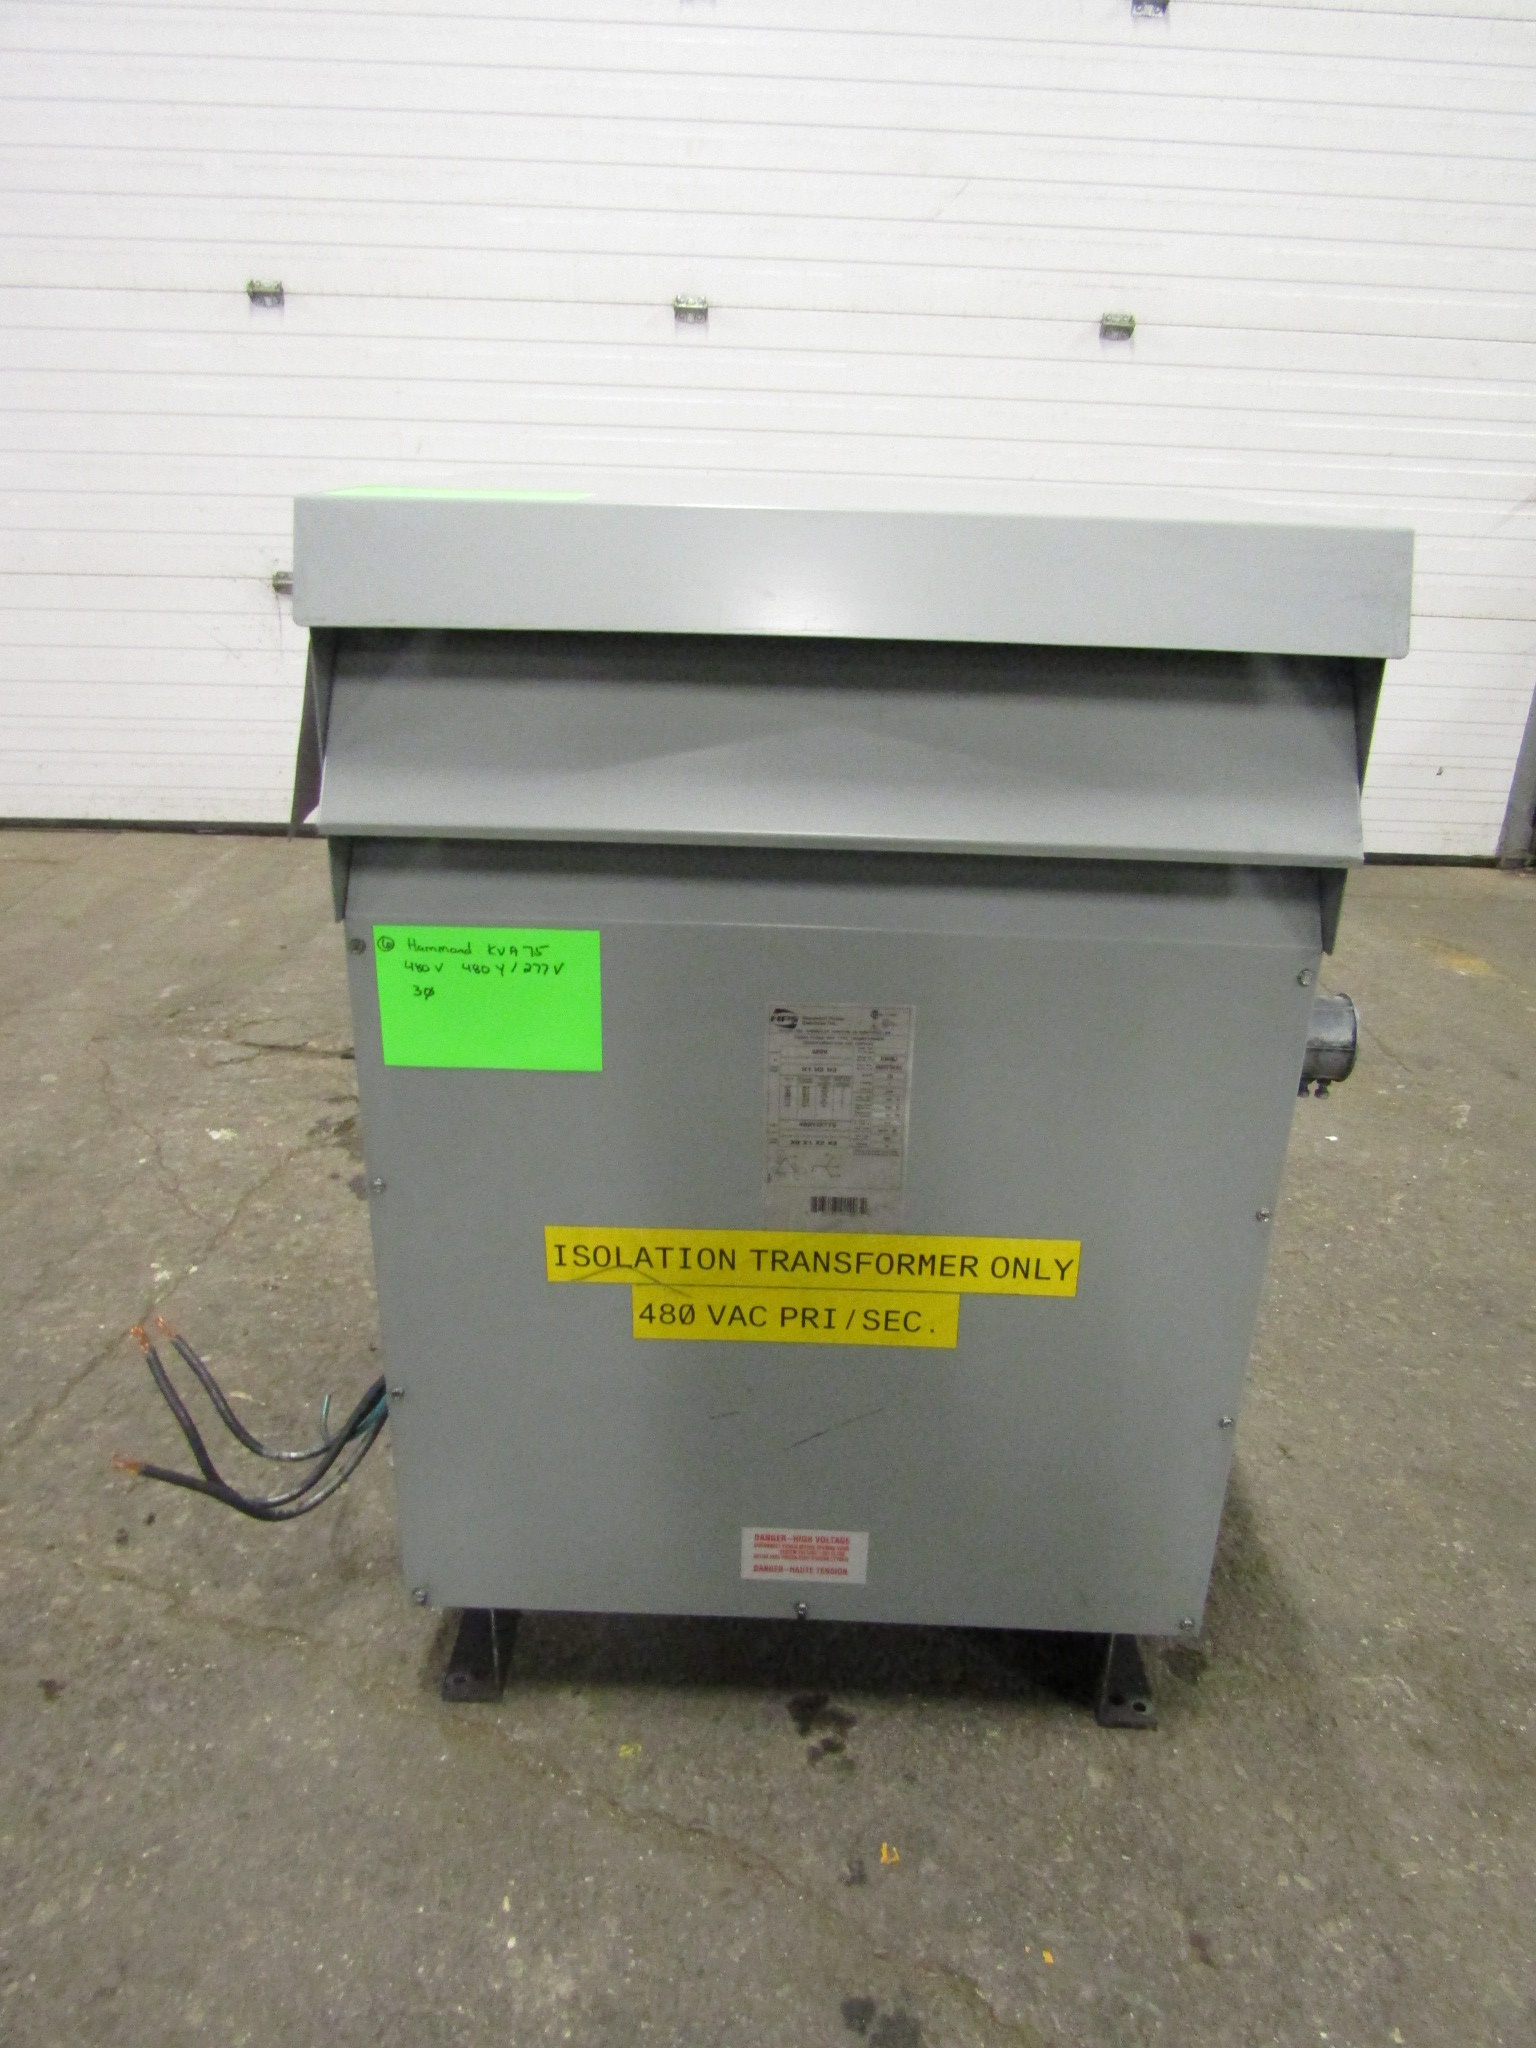 Lot 28 - Hammond 75 KVA Electrical Transformer - 480V to 480Y / 277V 3 phase